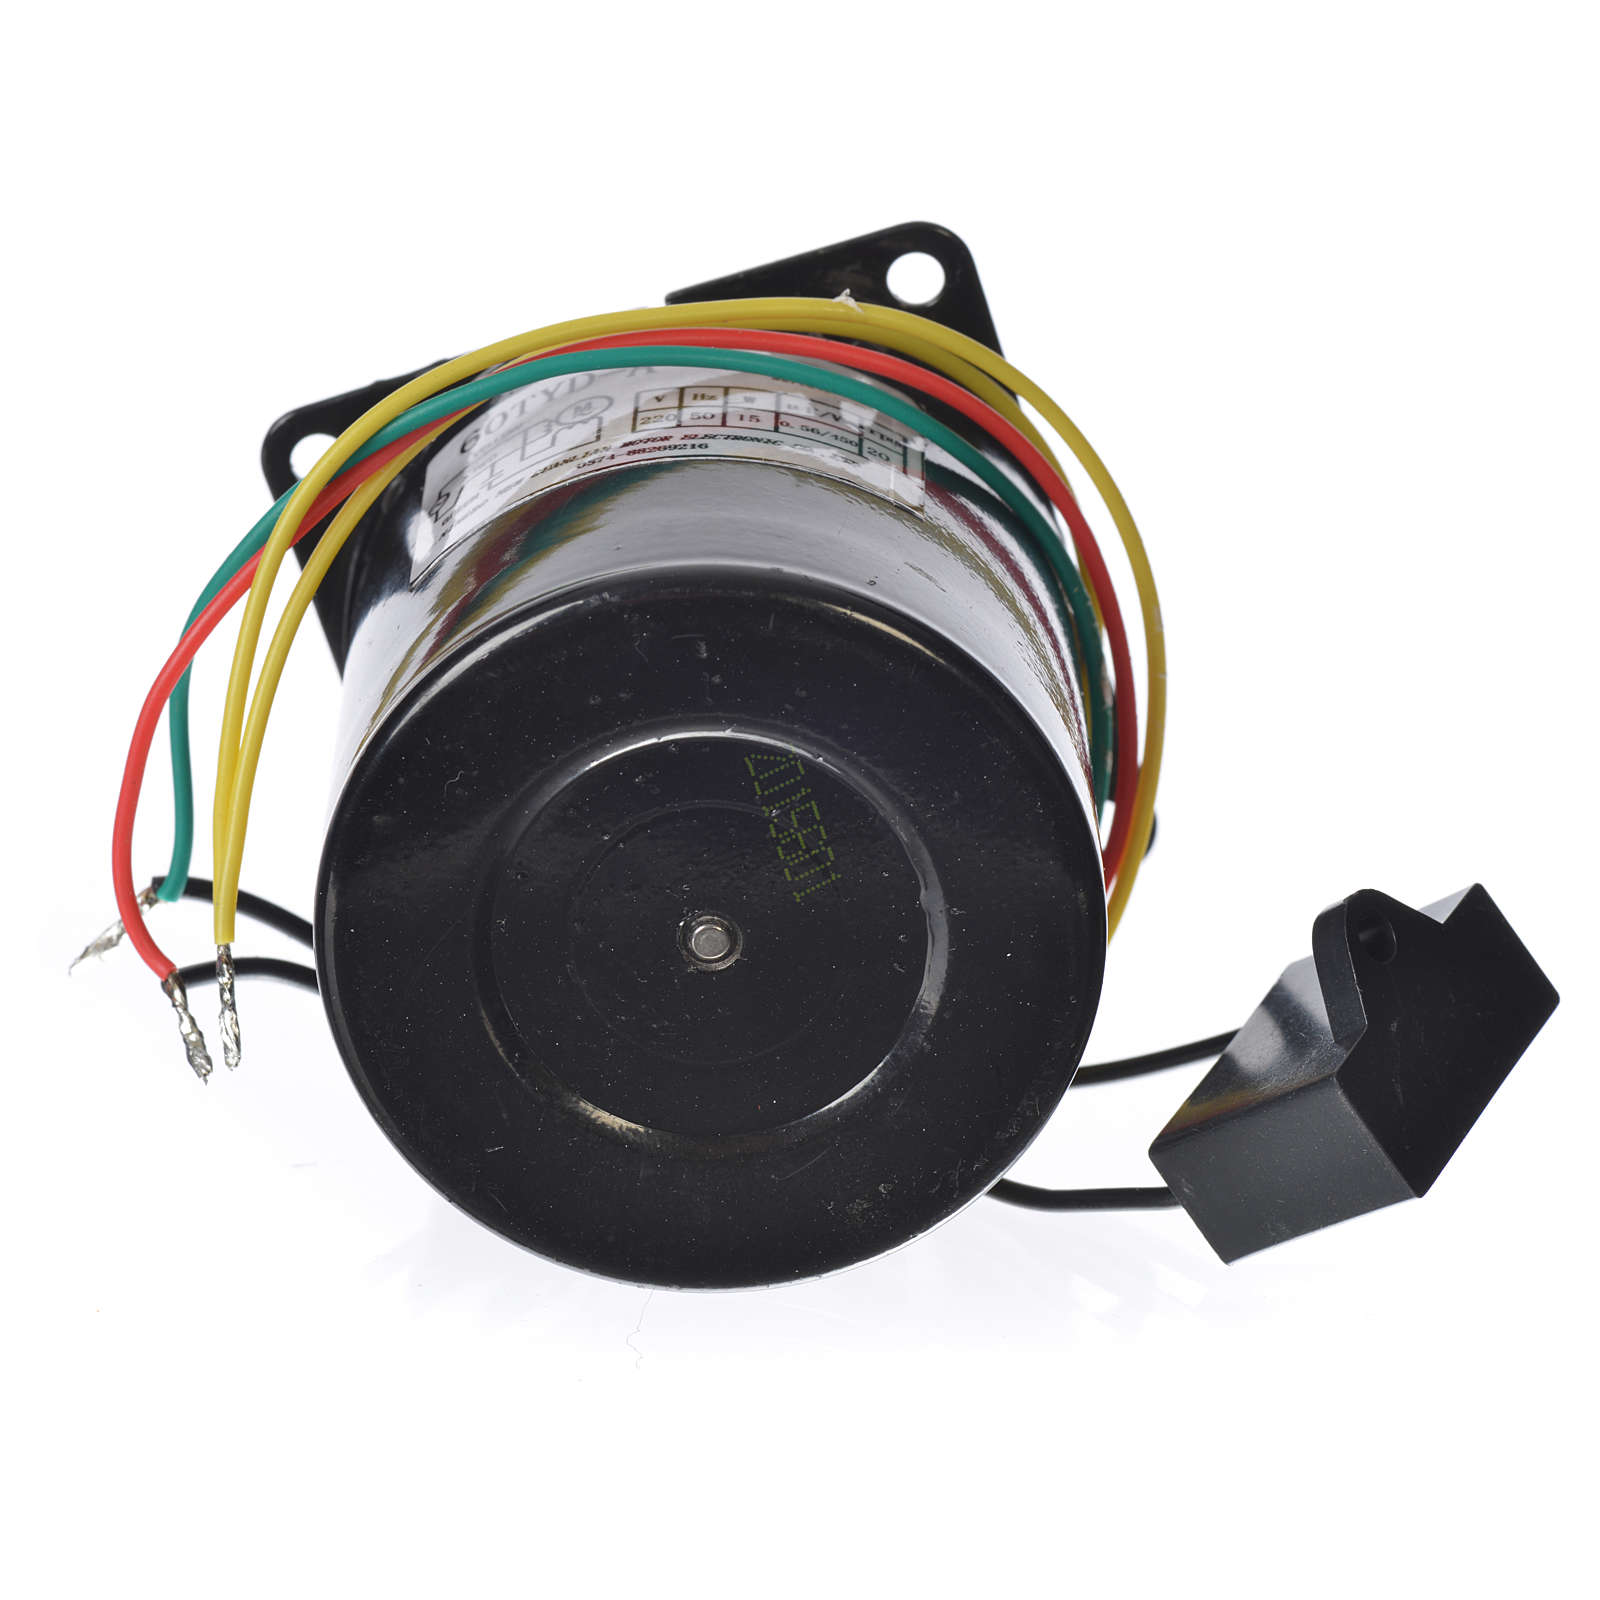 Motoriduttore MPW 20 giri/min presepe 4